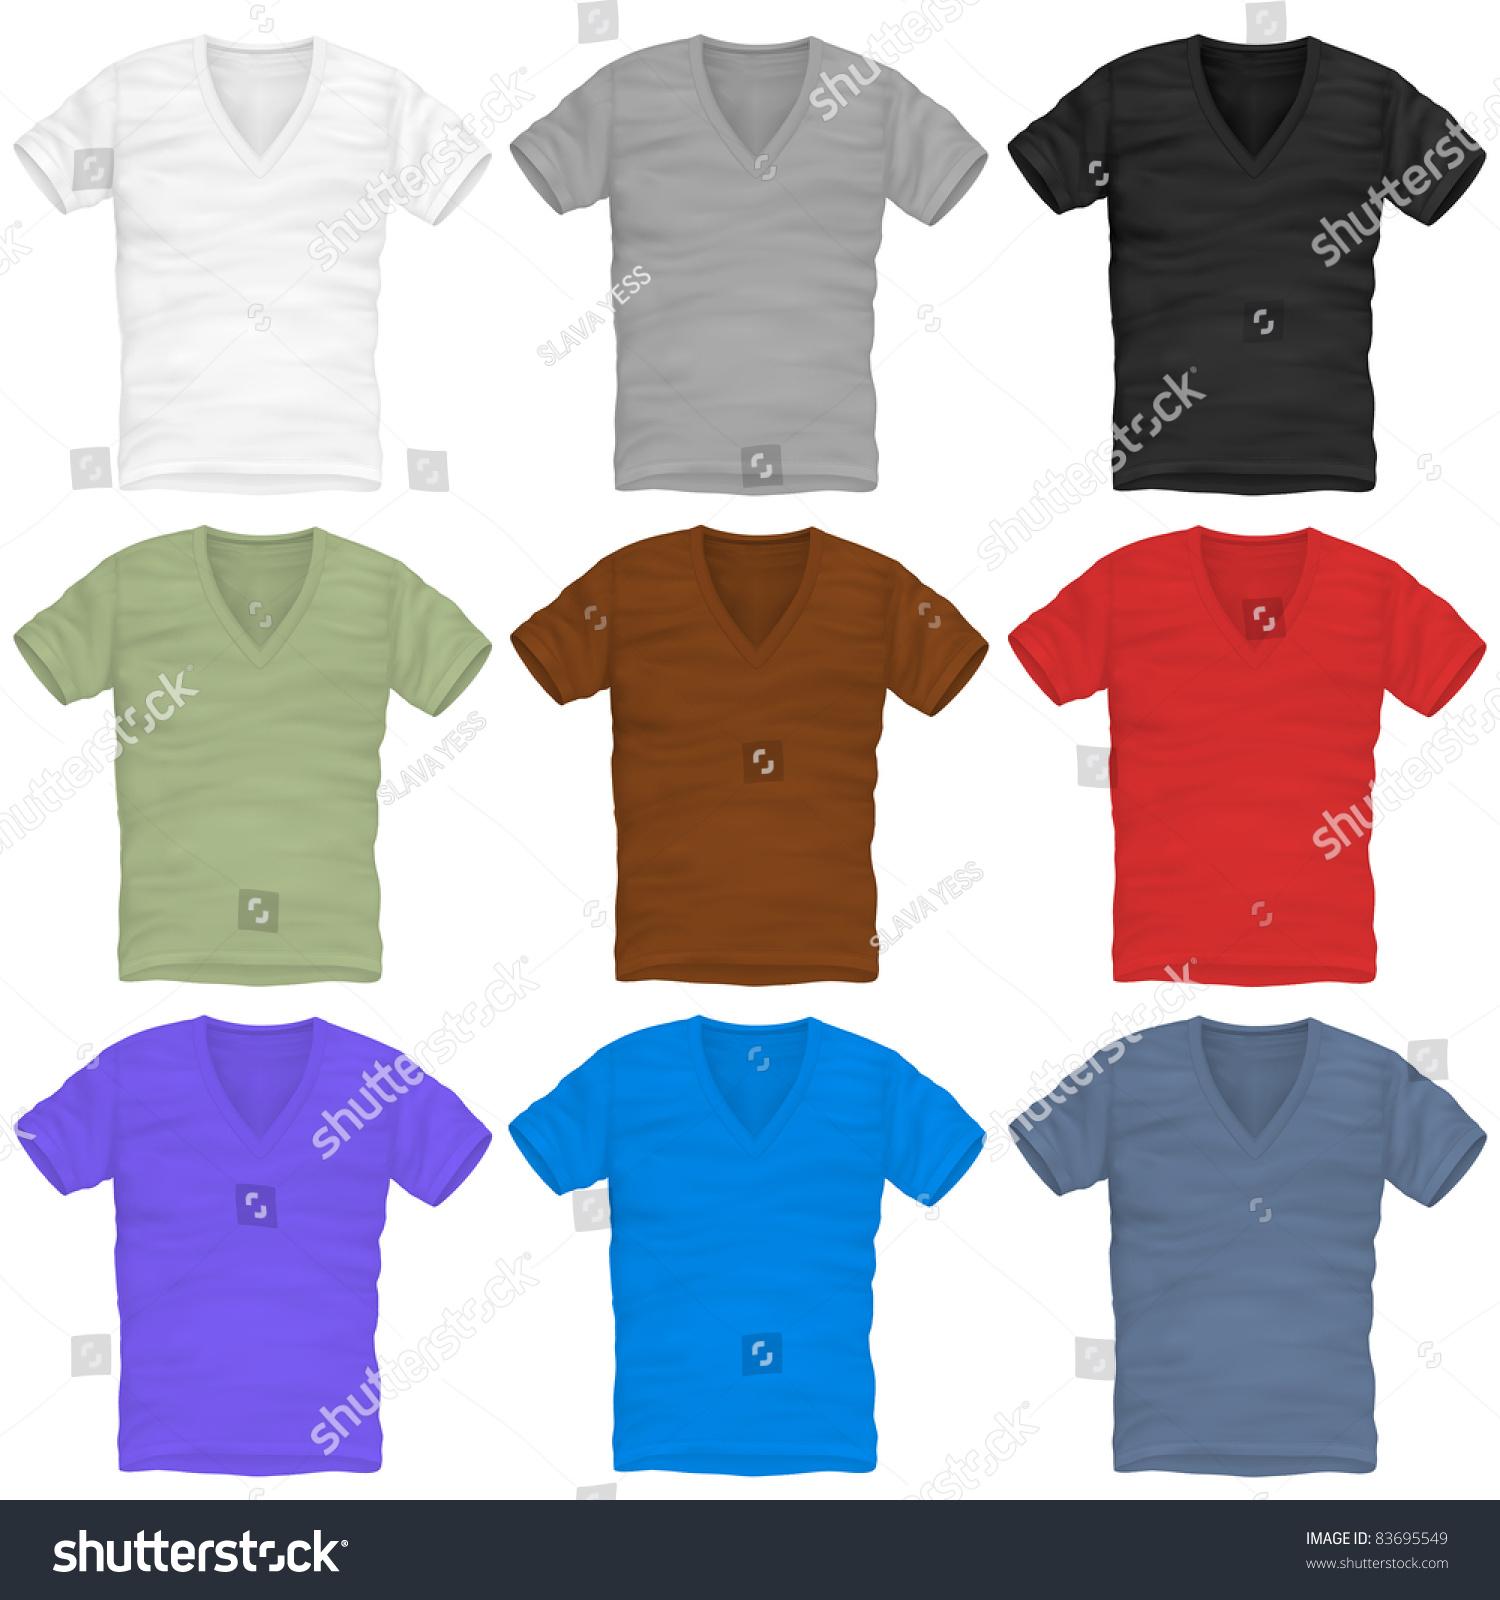 Design shirt v neck - Vector V Neck T Shirt Design Template